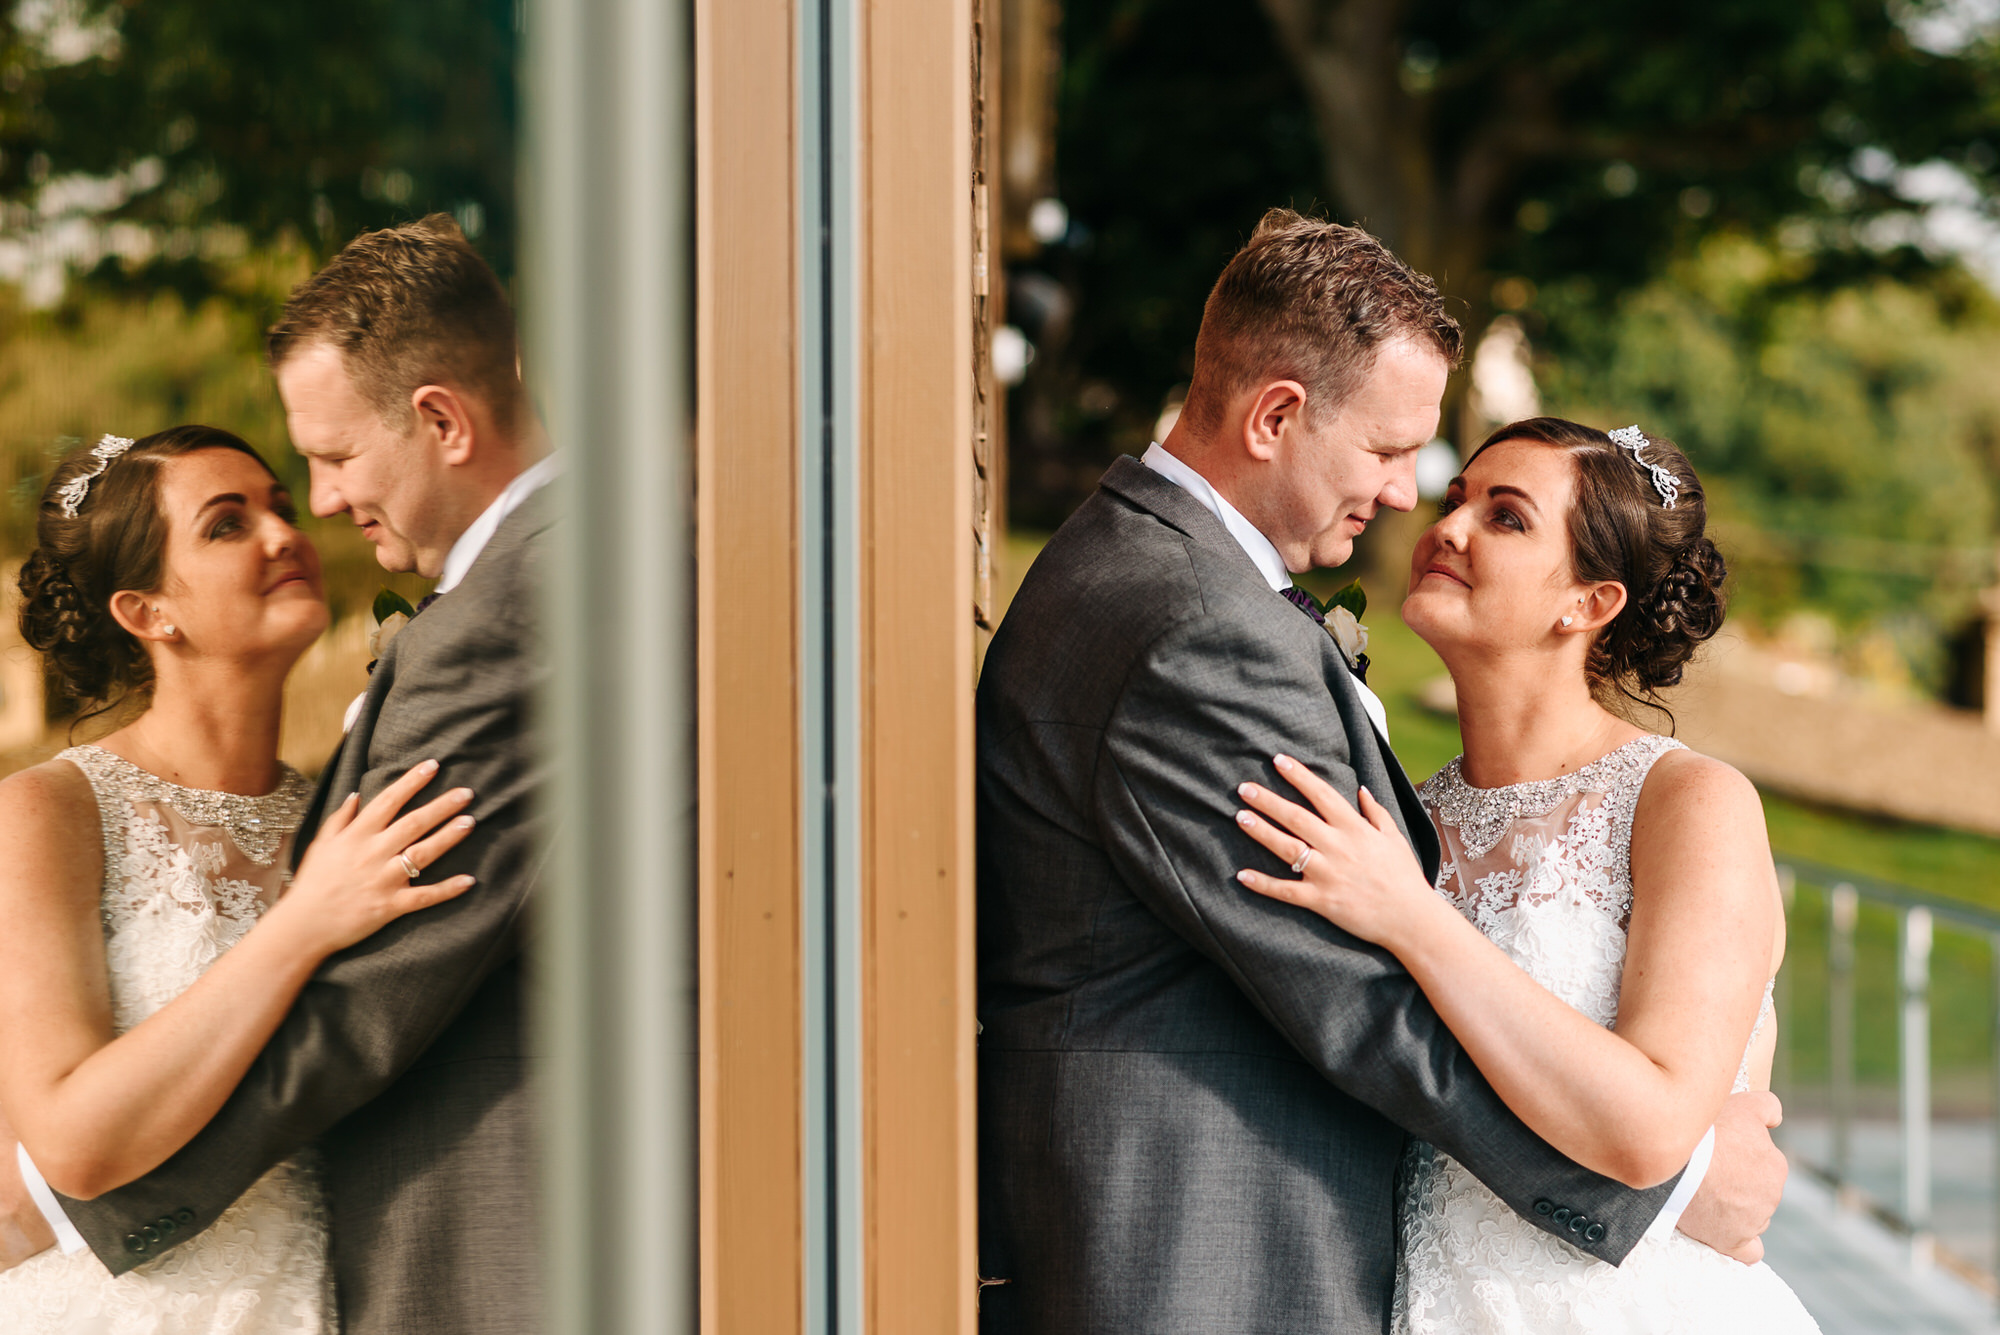 Best Of Yorkshire Wedding Photography 2017 - Martyn Hand-49.jpg